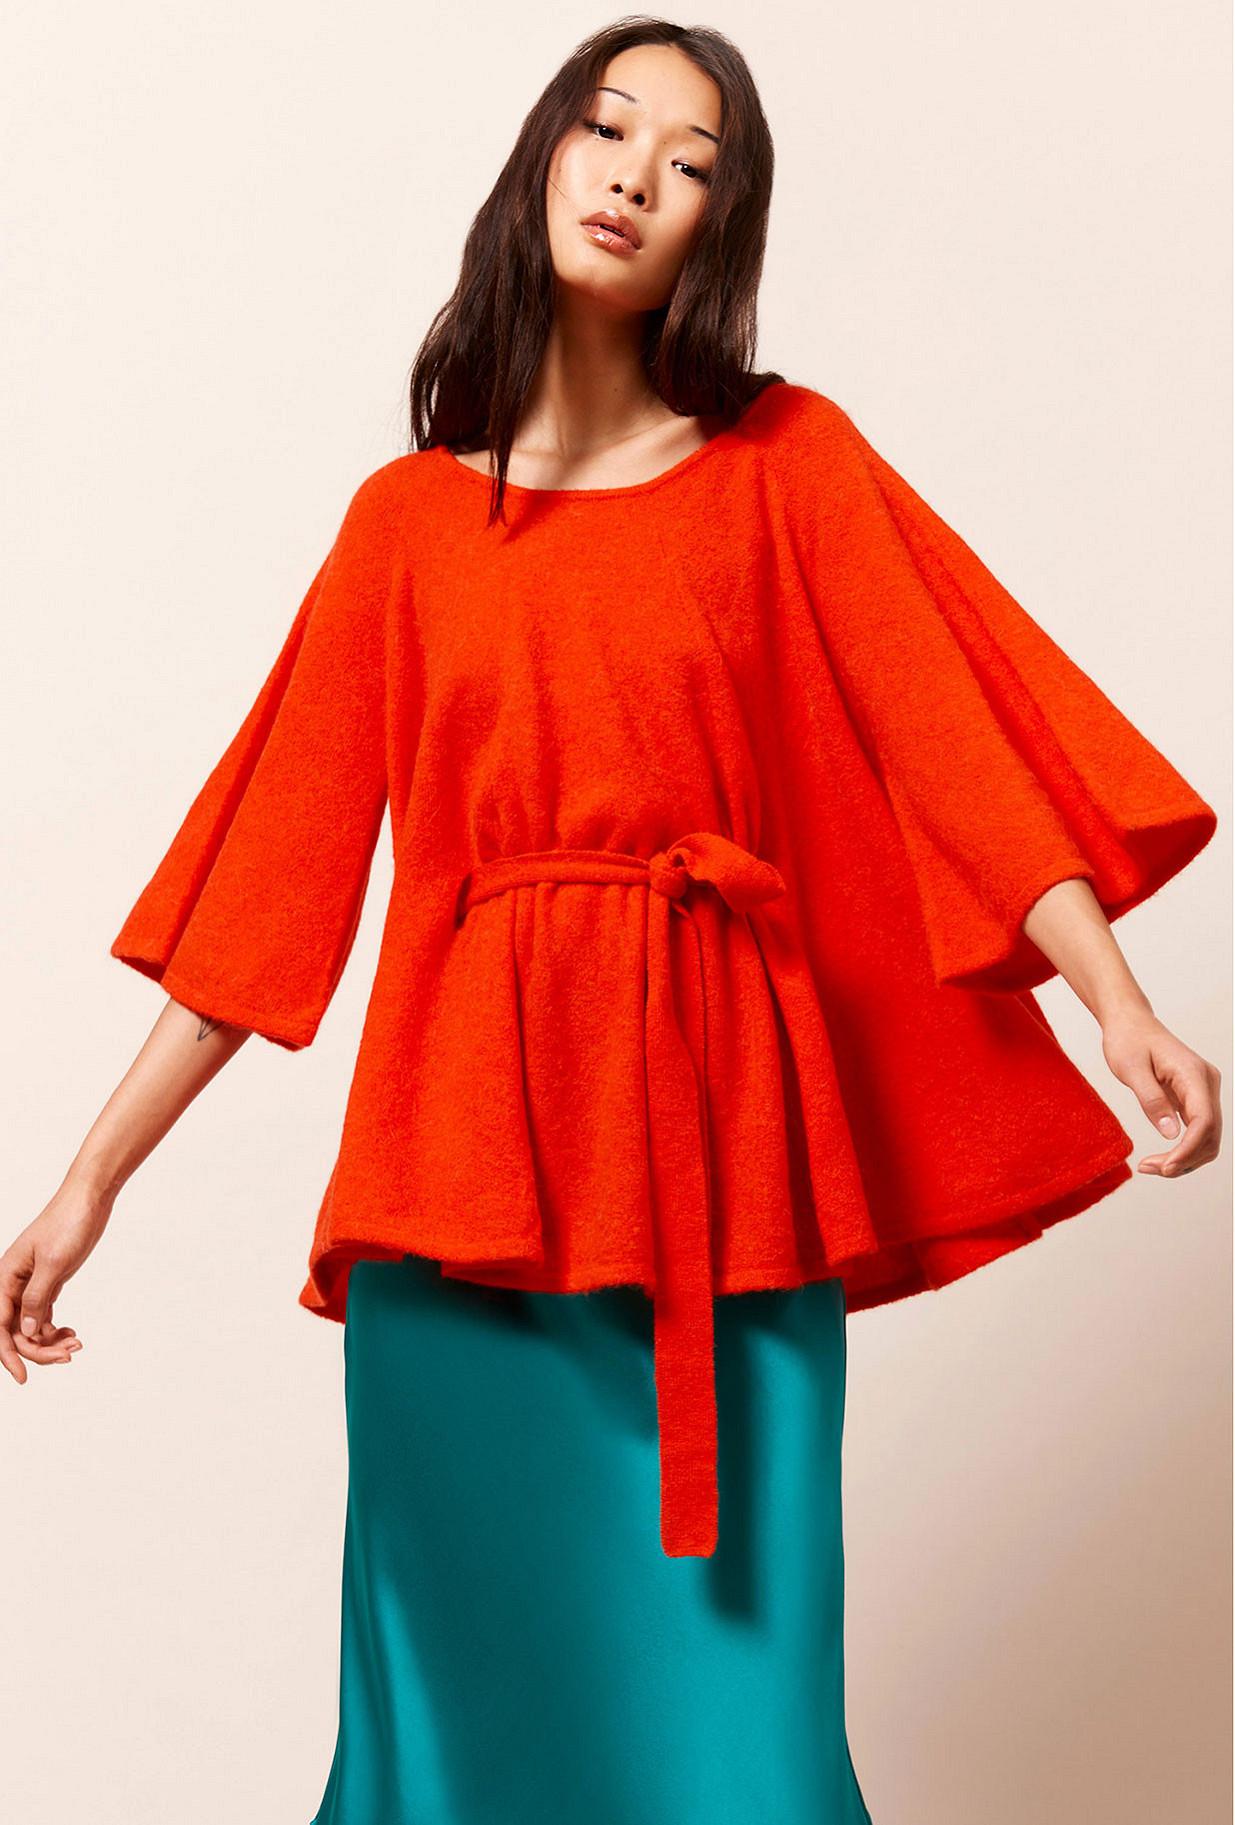 Coral Sweater Pampa Mes Demoiselles Paris